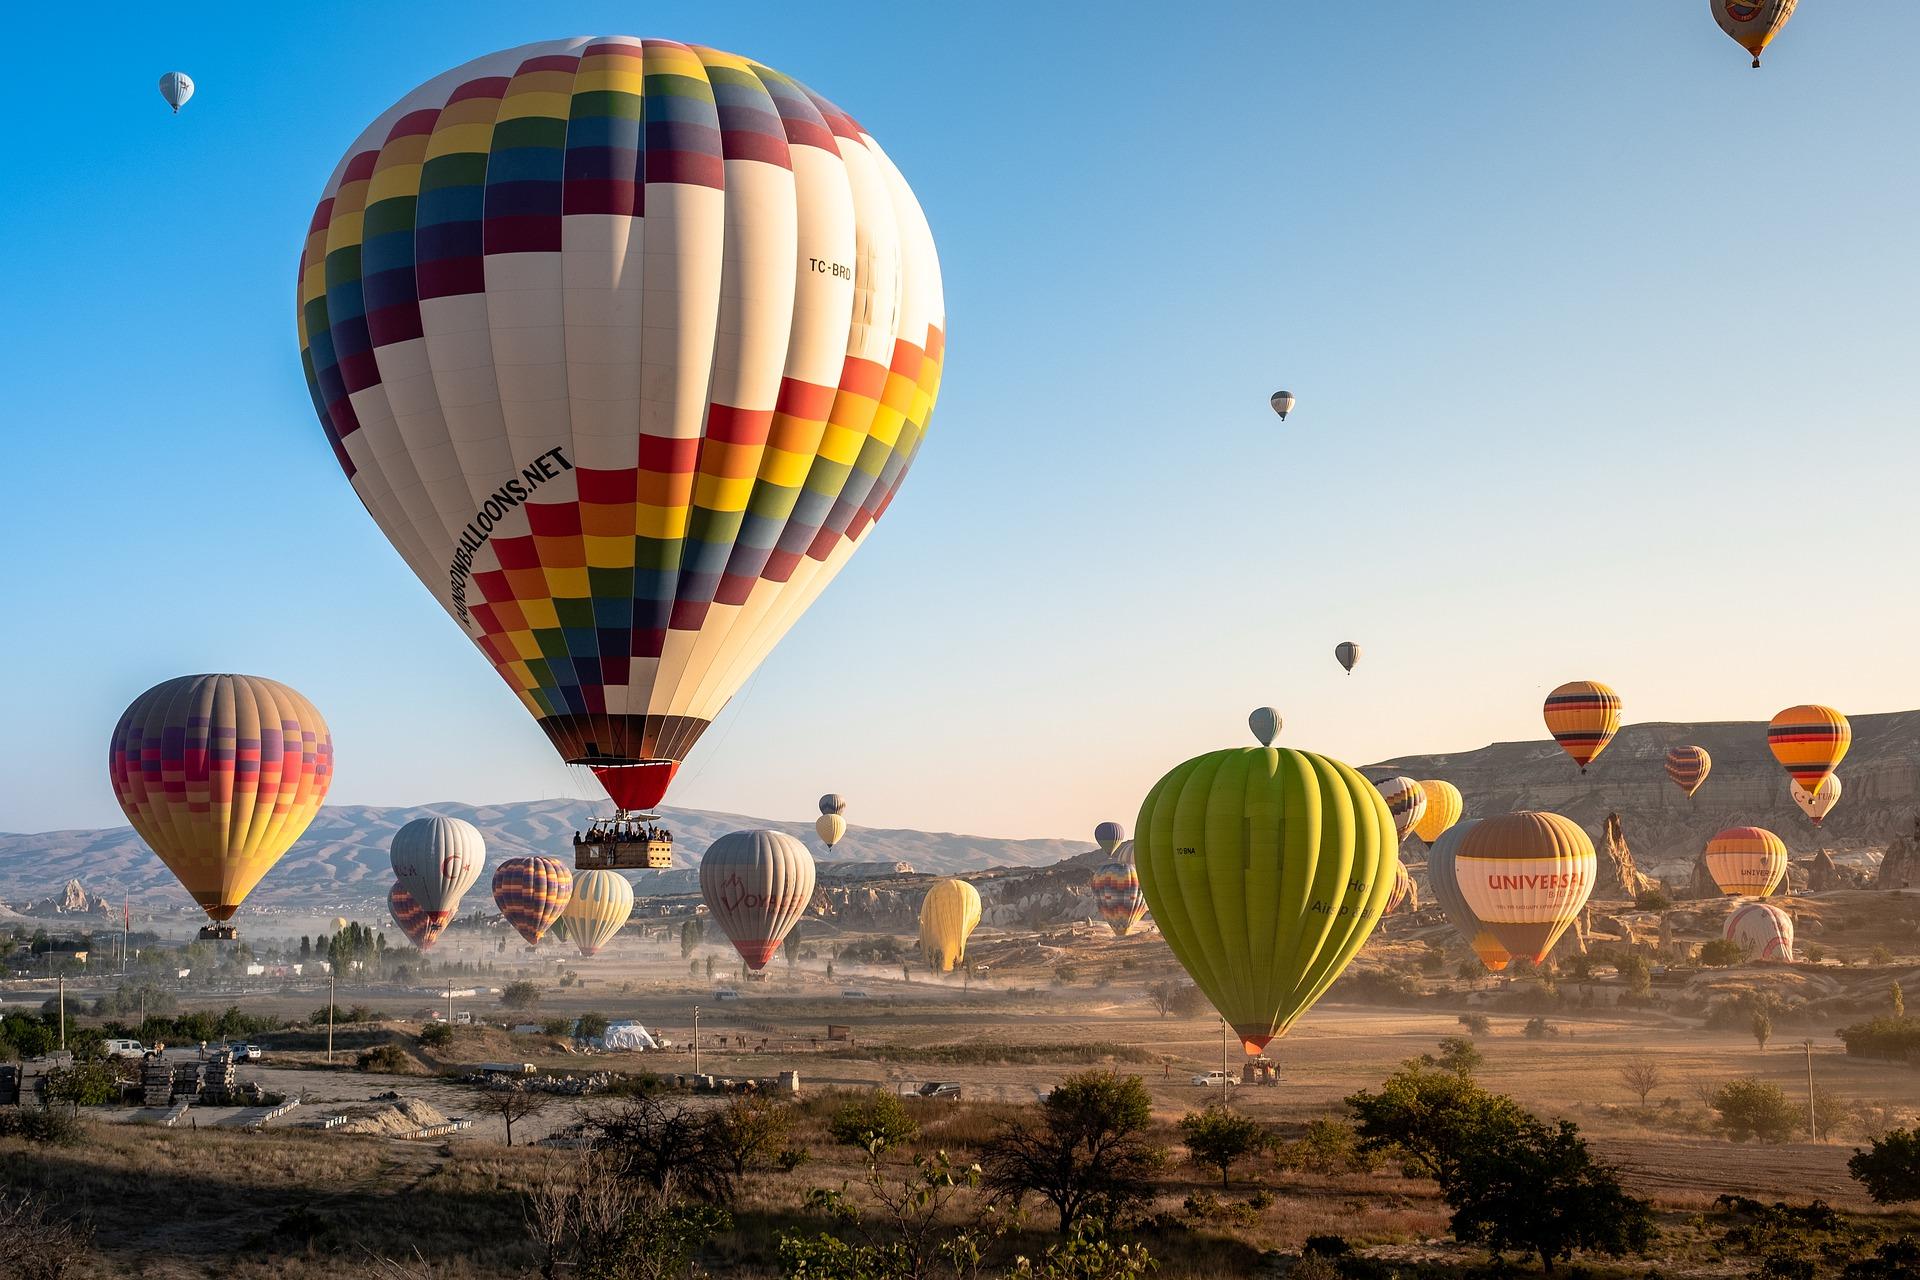 Prezent dla siebie samej - lot balonem